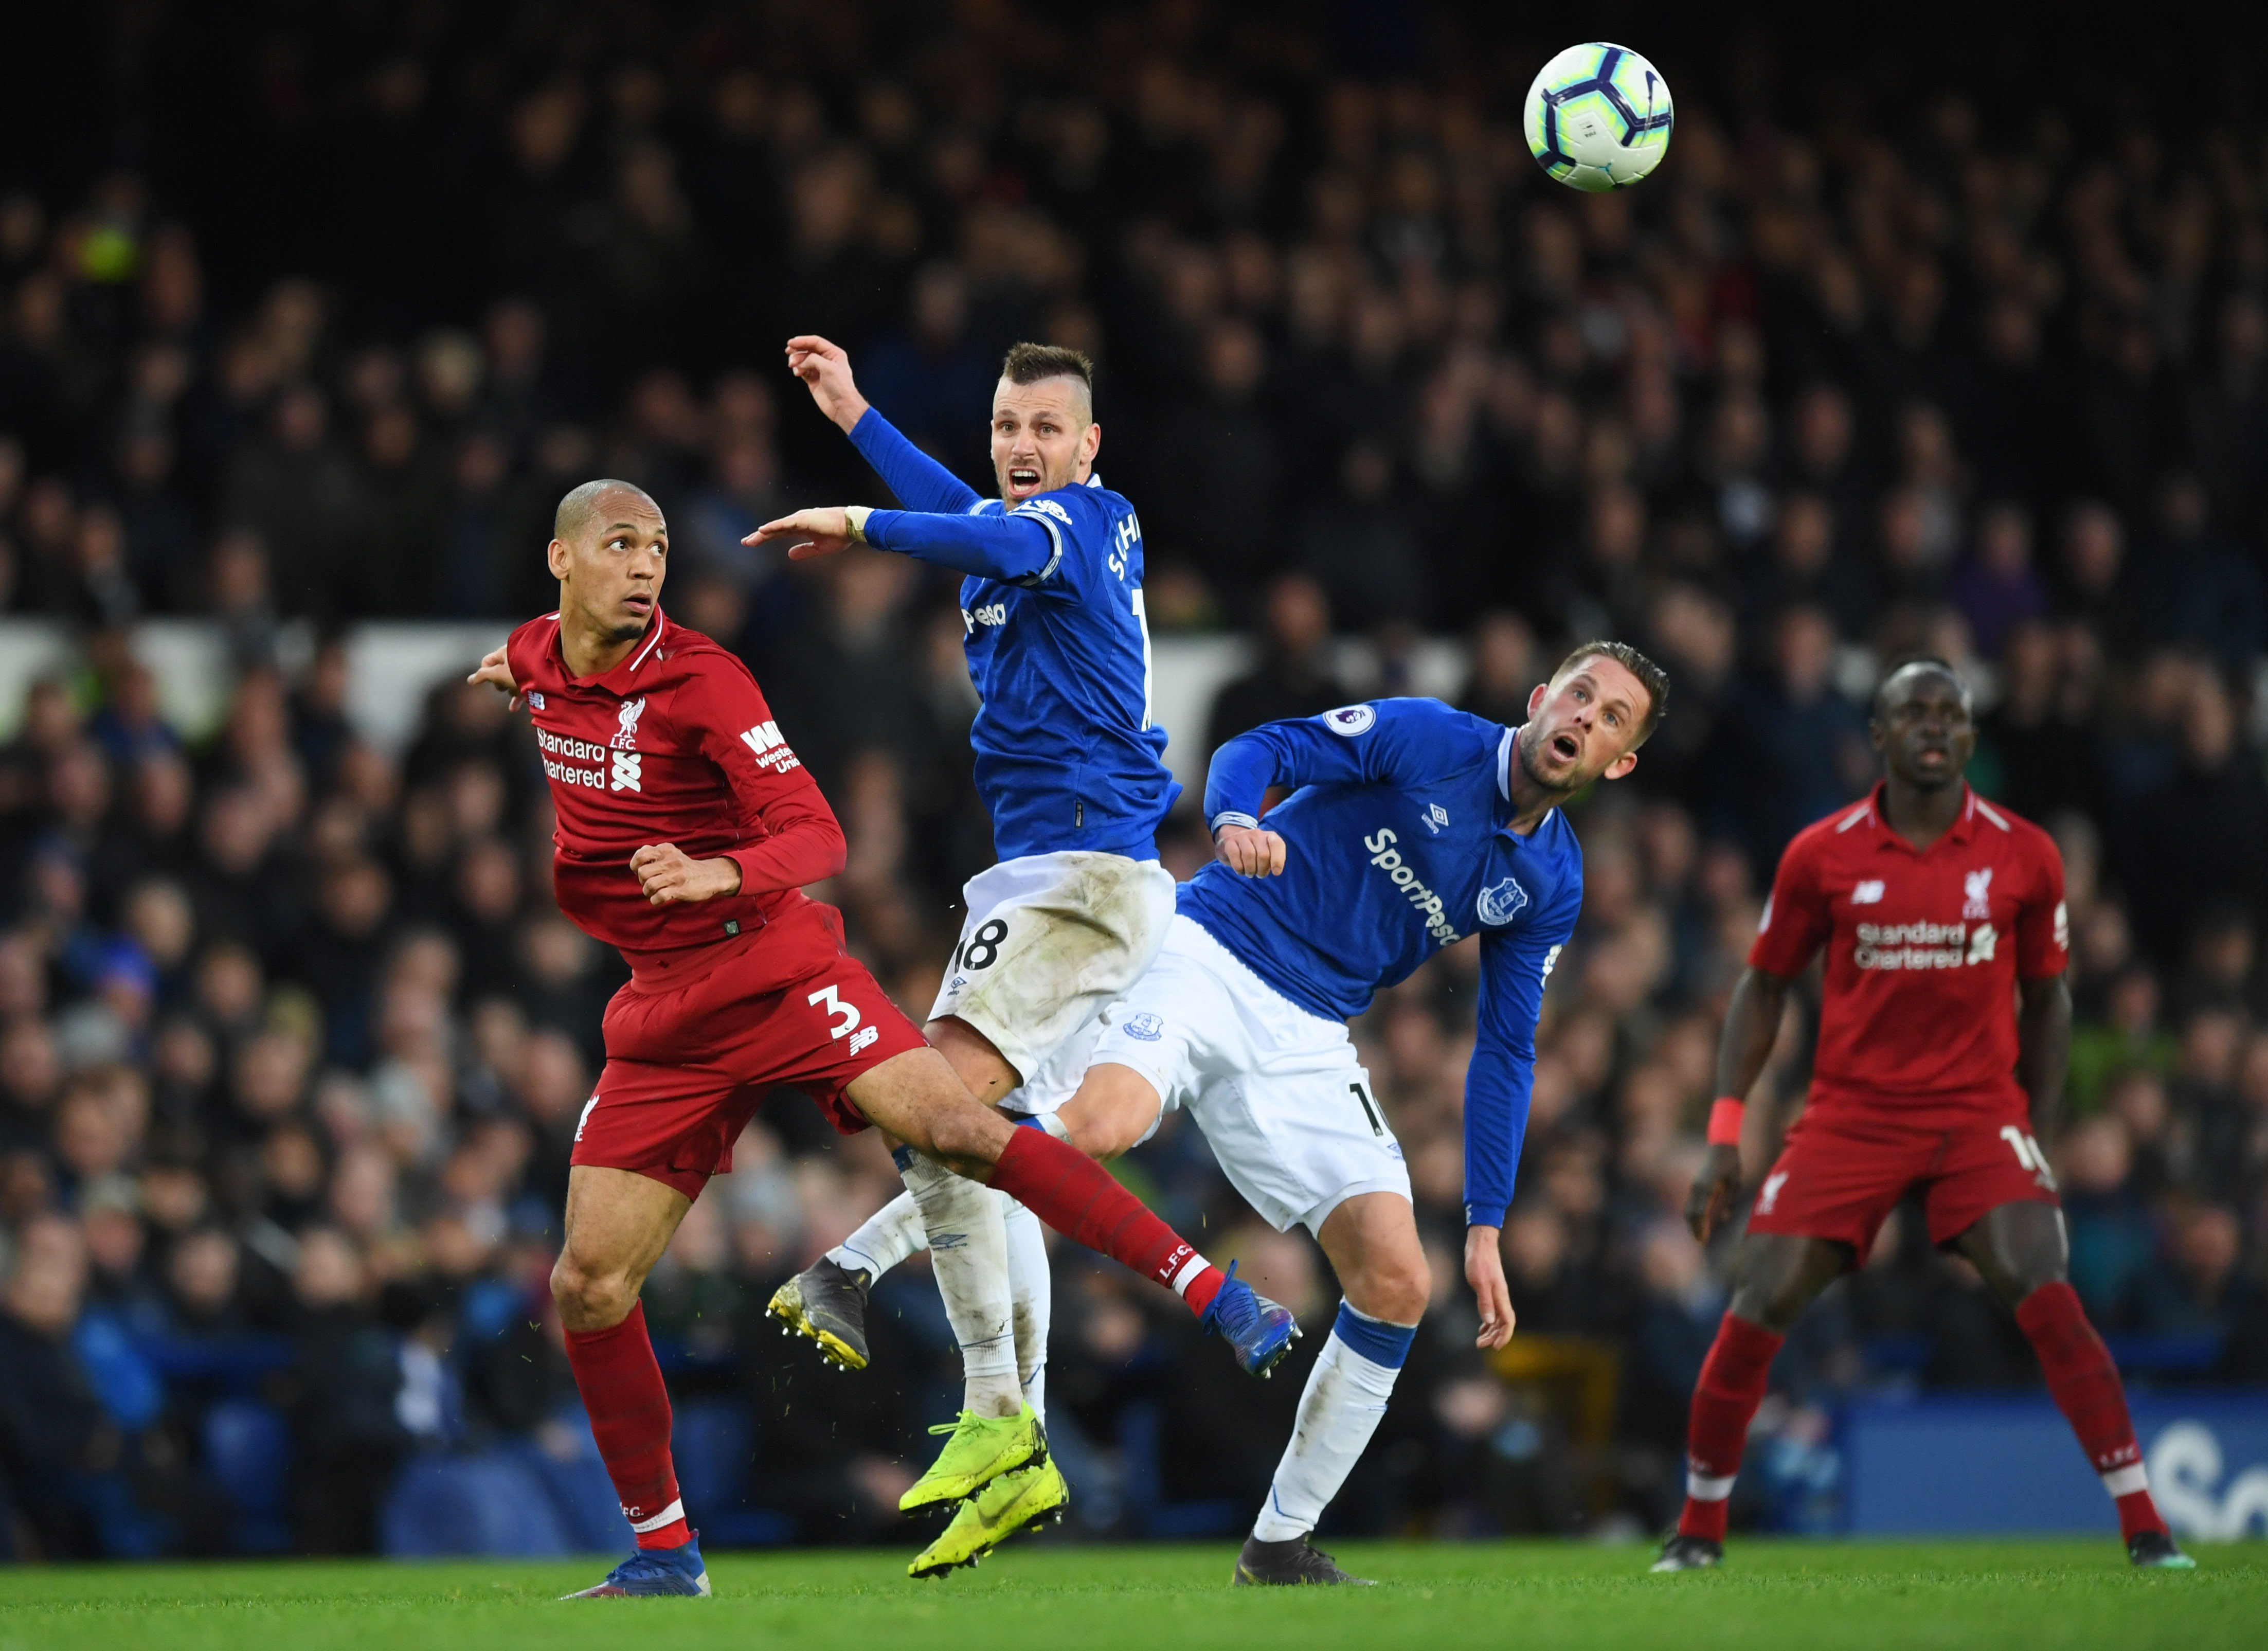 Everton 0, Liverpool 0: Man of the Match